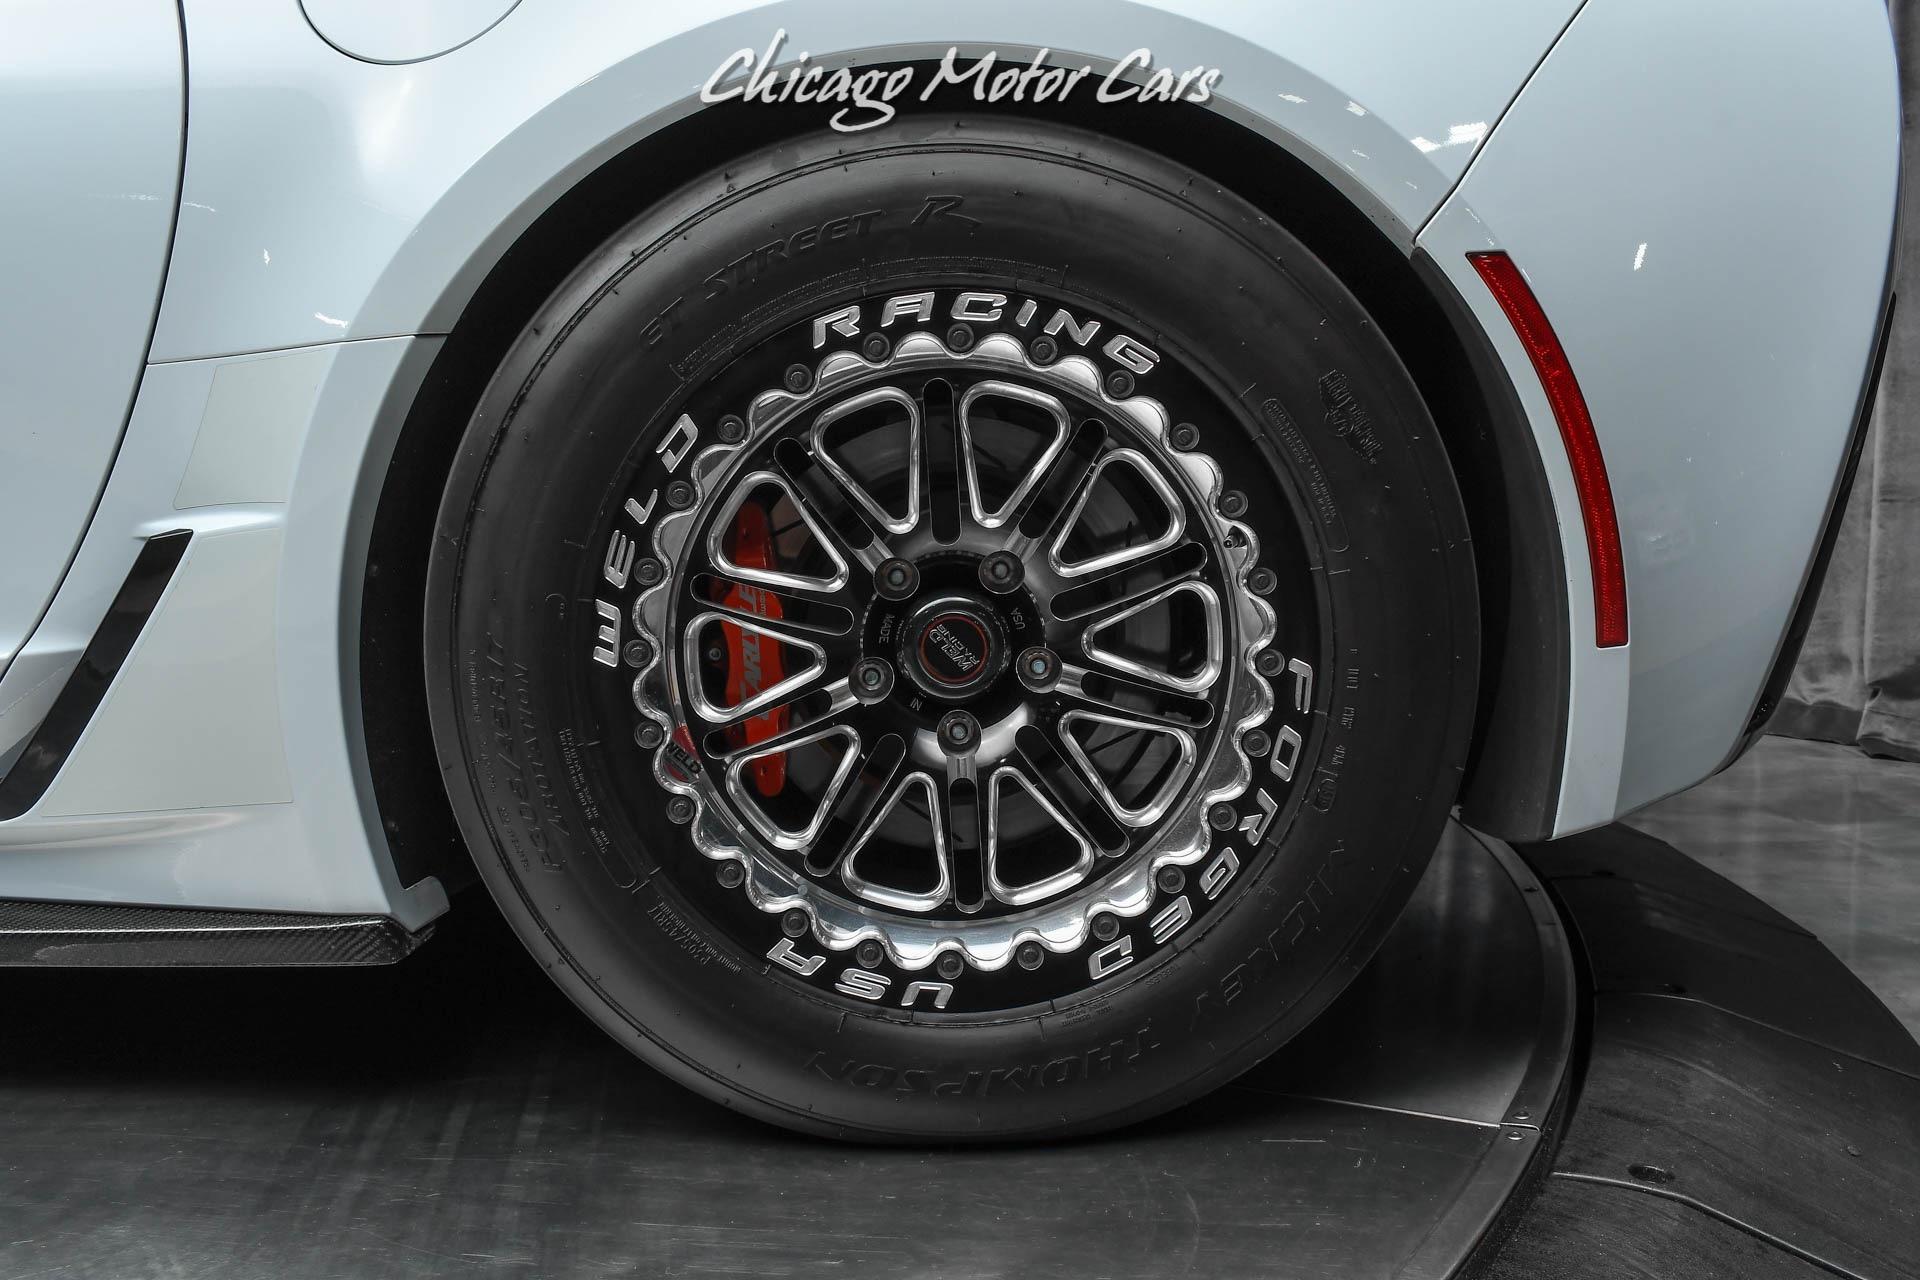 Used-2018-Chevrolet-Corvette-Z06-2LZ-Coupe-1000HP-MANUAL-TRANSMISSION